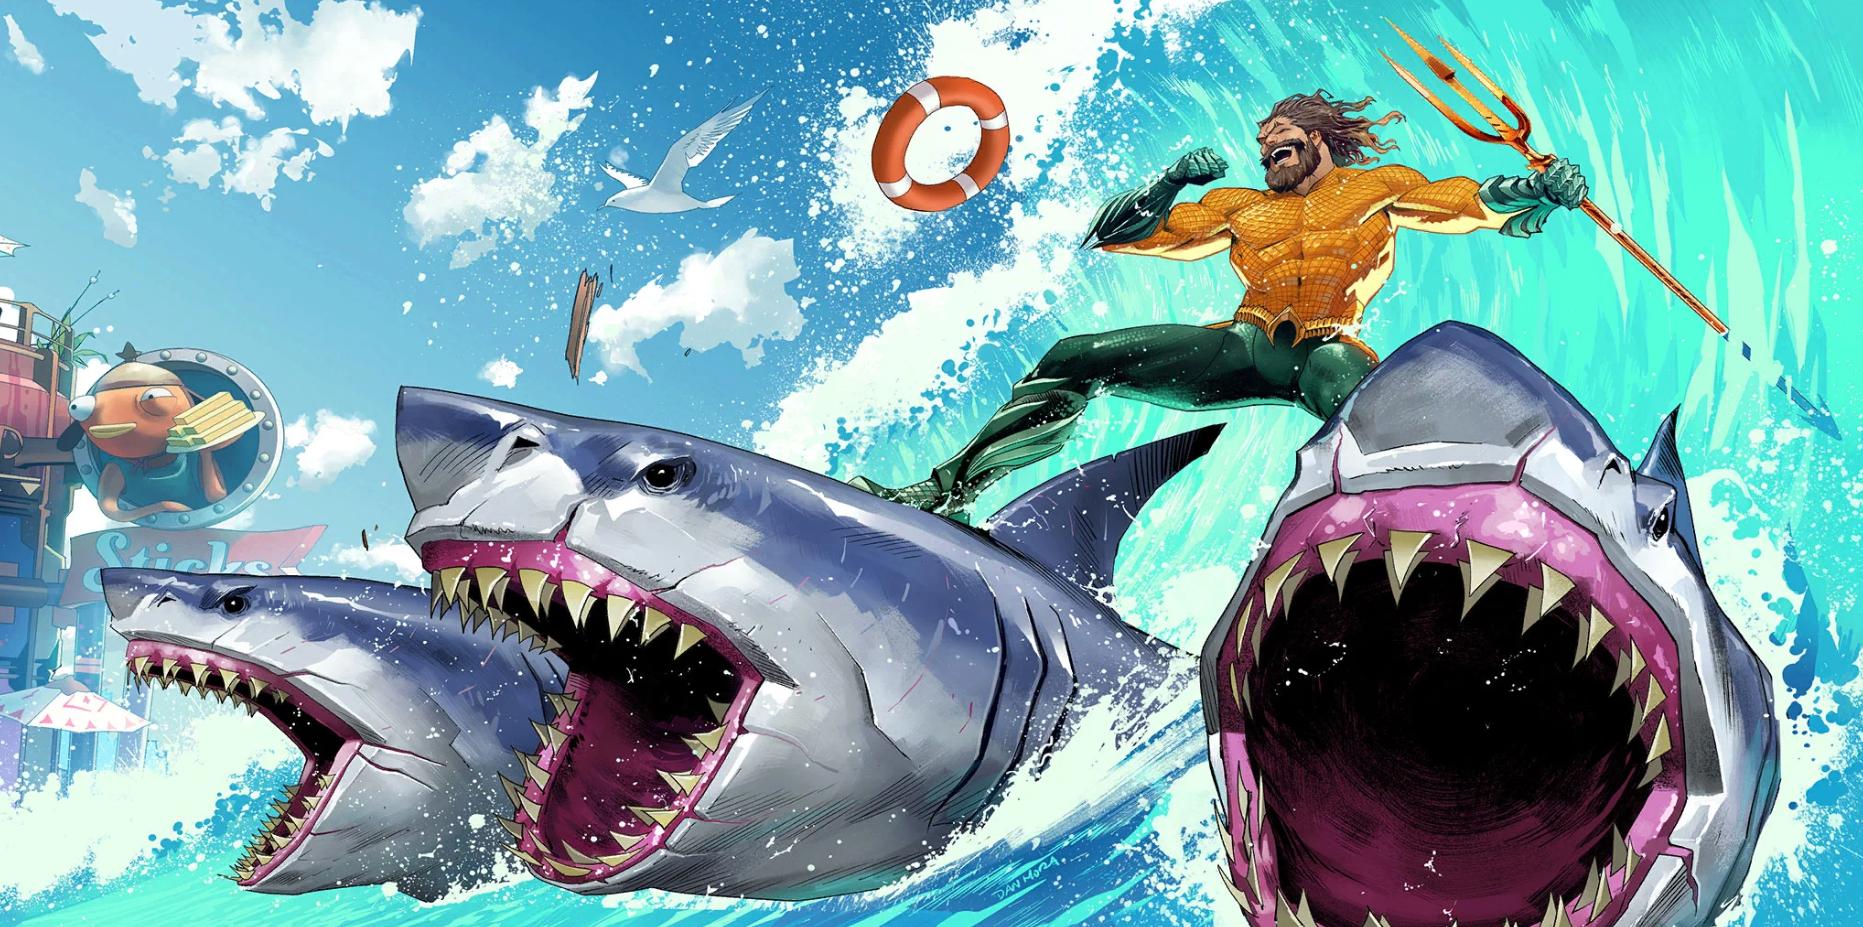 Fortnite Chapter 2 Season 3 Aquaman Week 1 King of the Beach Écran de chargement